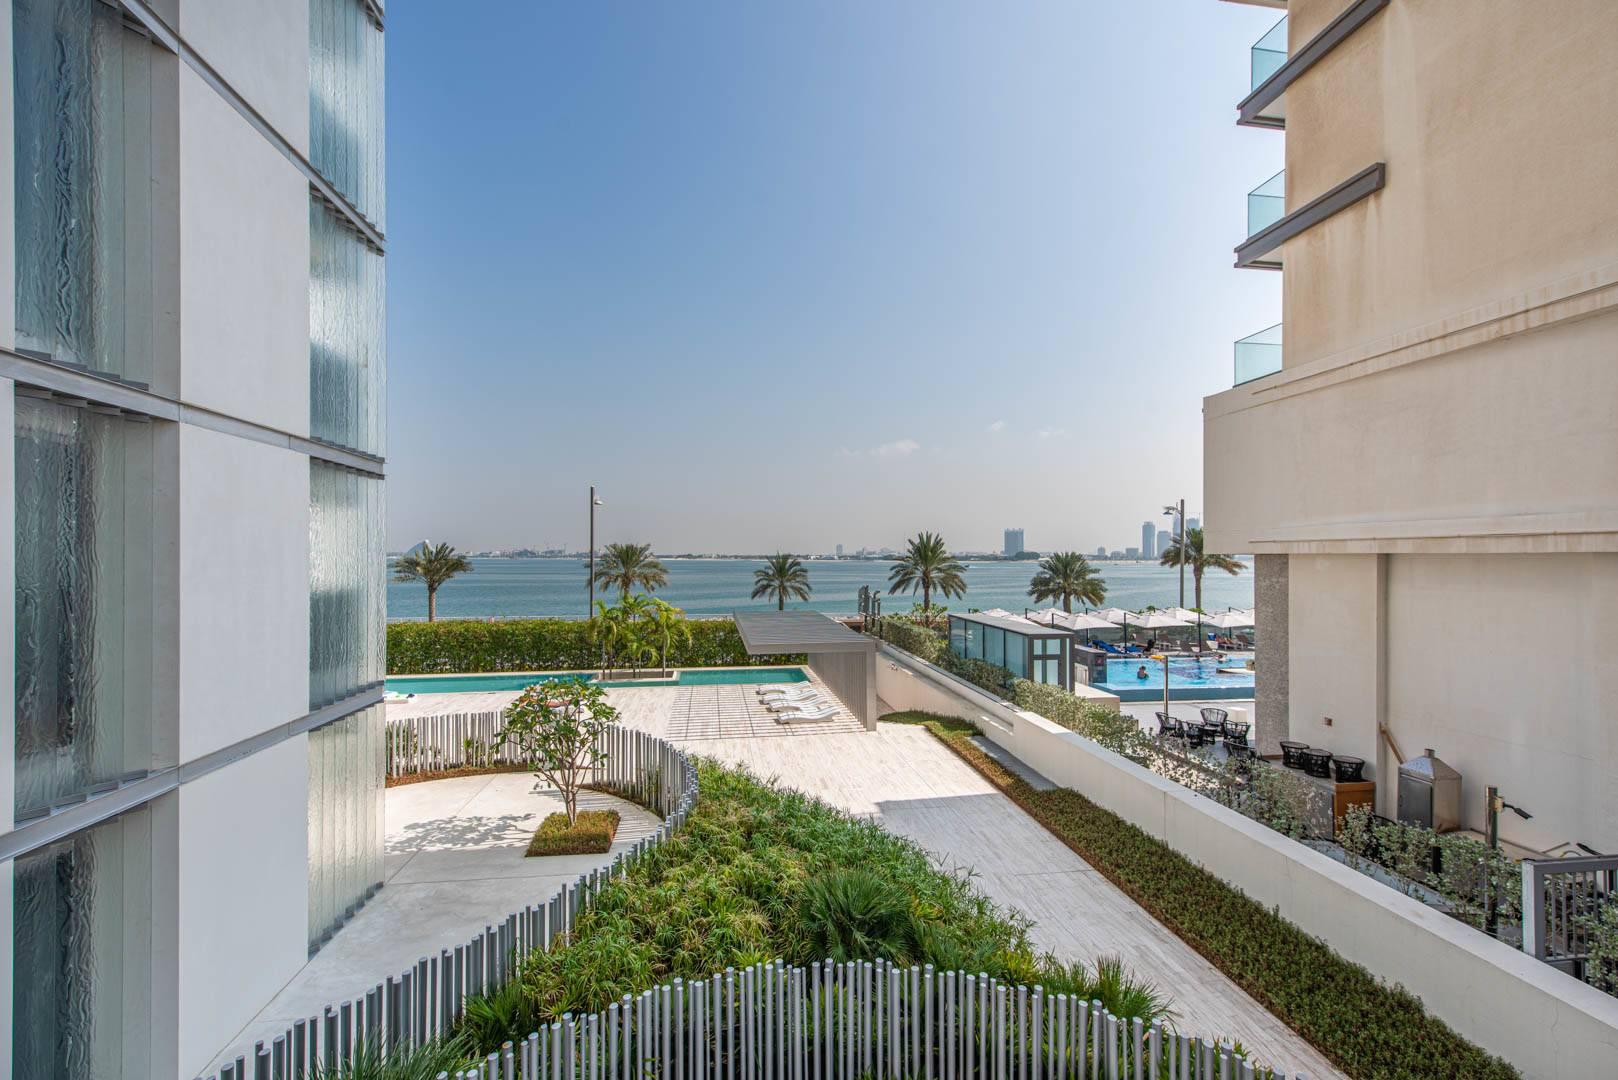 Апартаменты, Аренда в Muraba Residences Дубай, ОАЭ